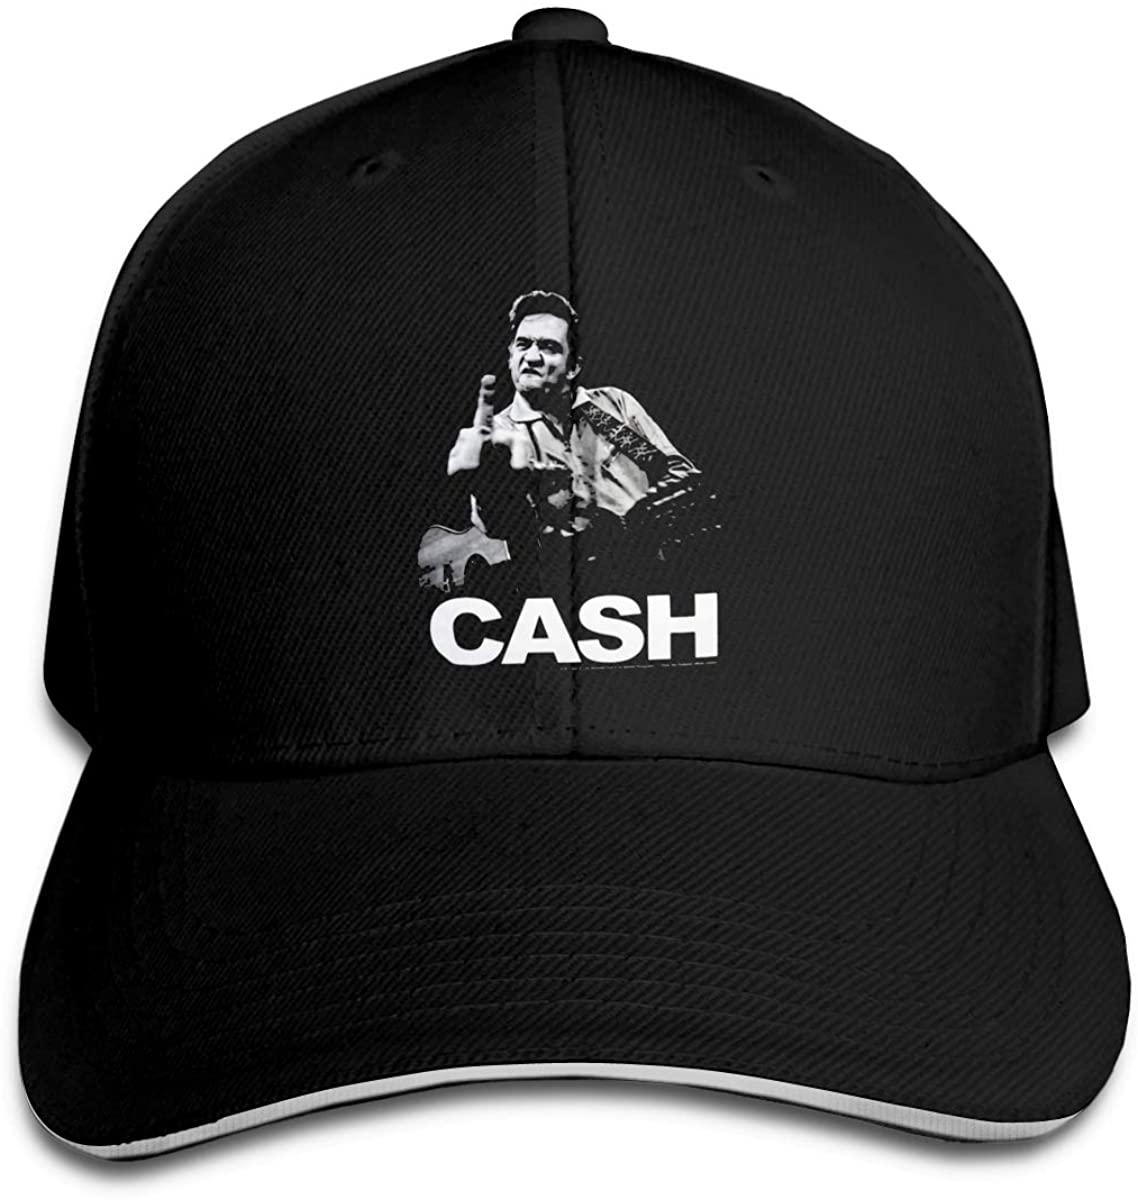 Johnny Cash Classic Baseball Cap Unisex Cotton Adjustable Hat for Kids Teens Adults